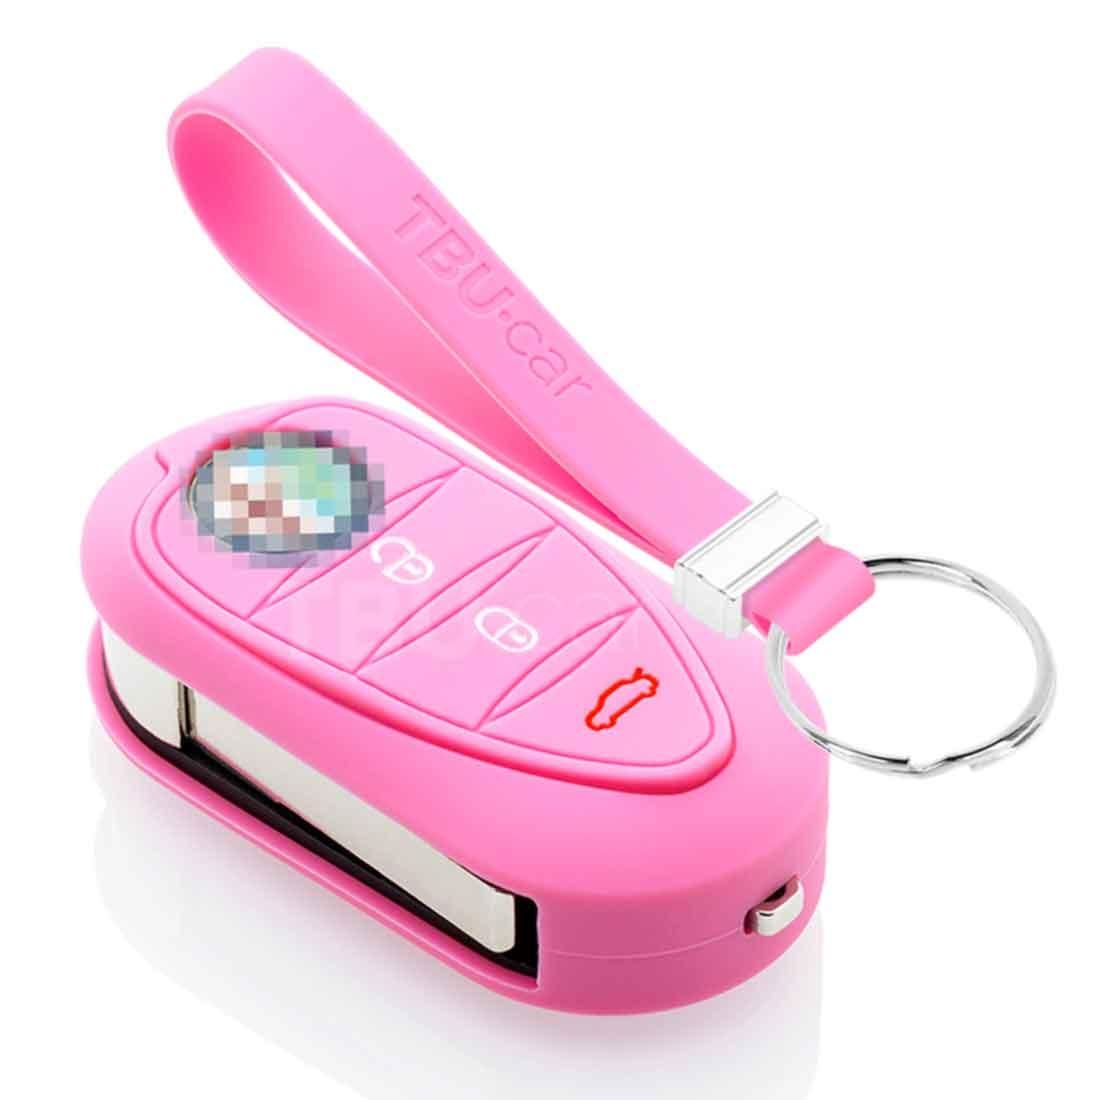 TBU car TBU car Sleutel cover compatibel met Alfa Romeo - Silicone sleutelhoesje - beschermhoesje autosleutel - Roze